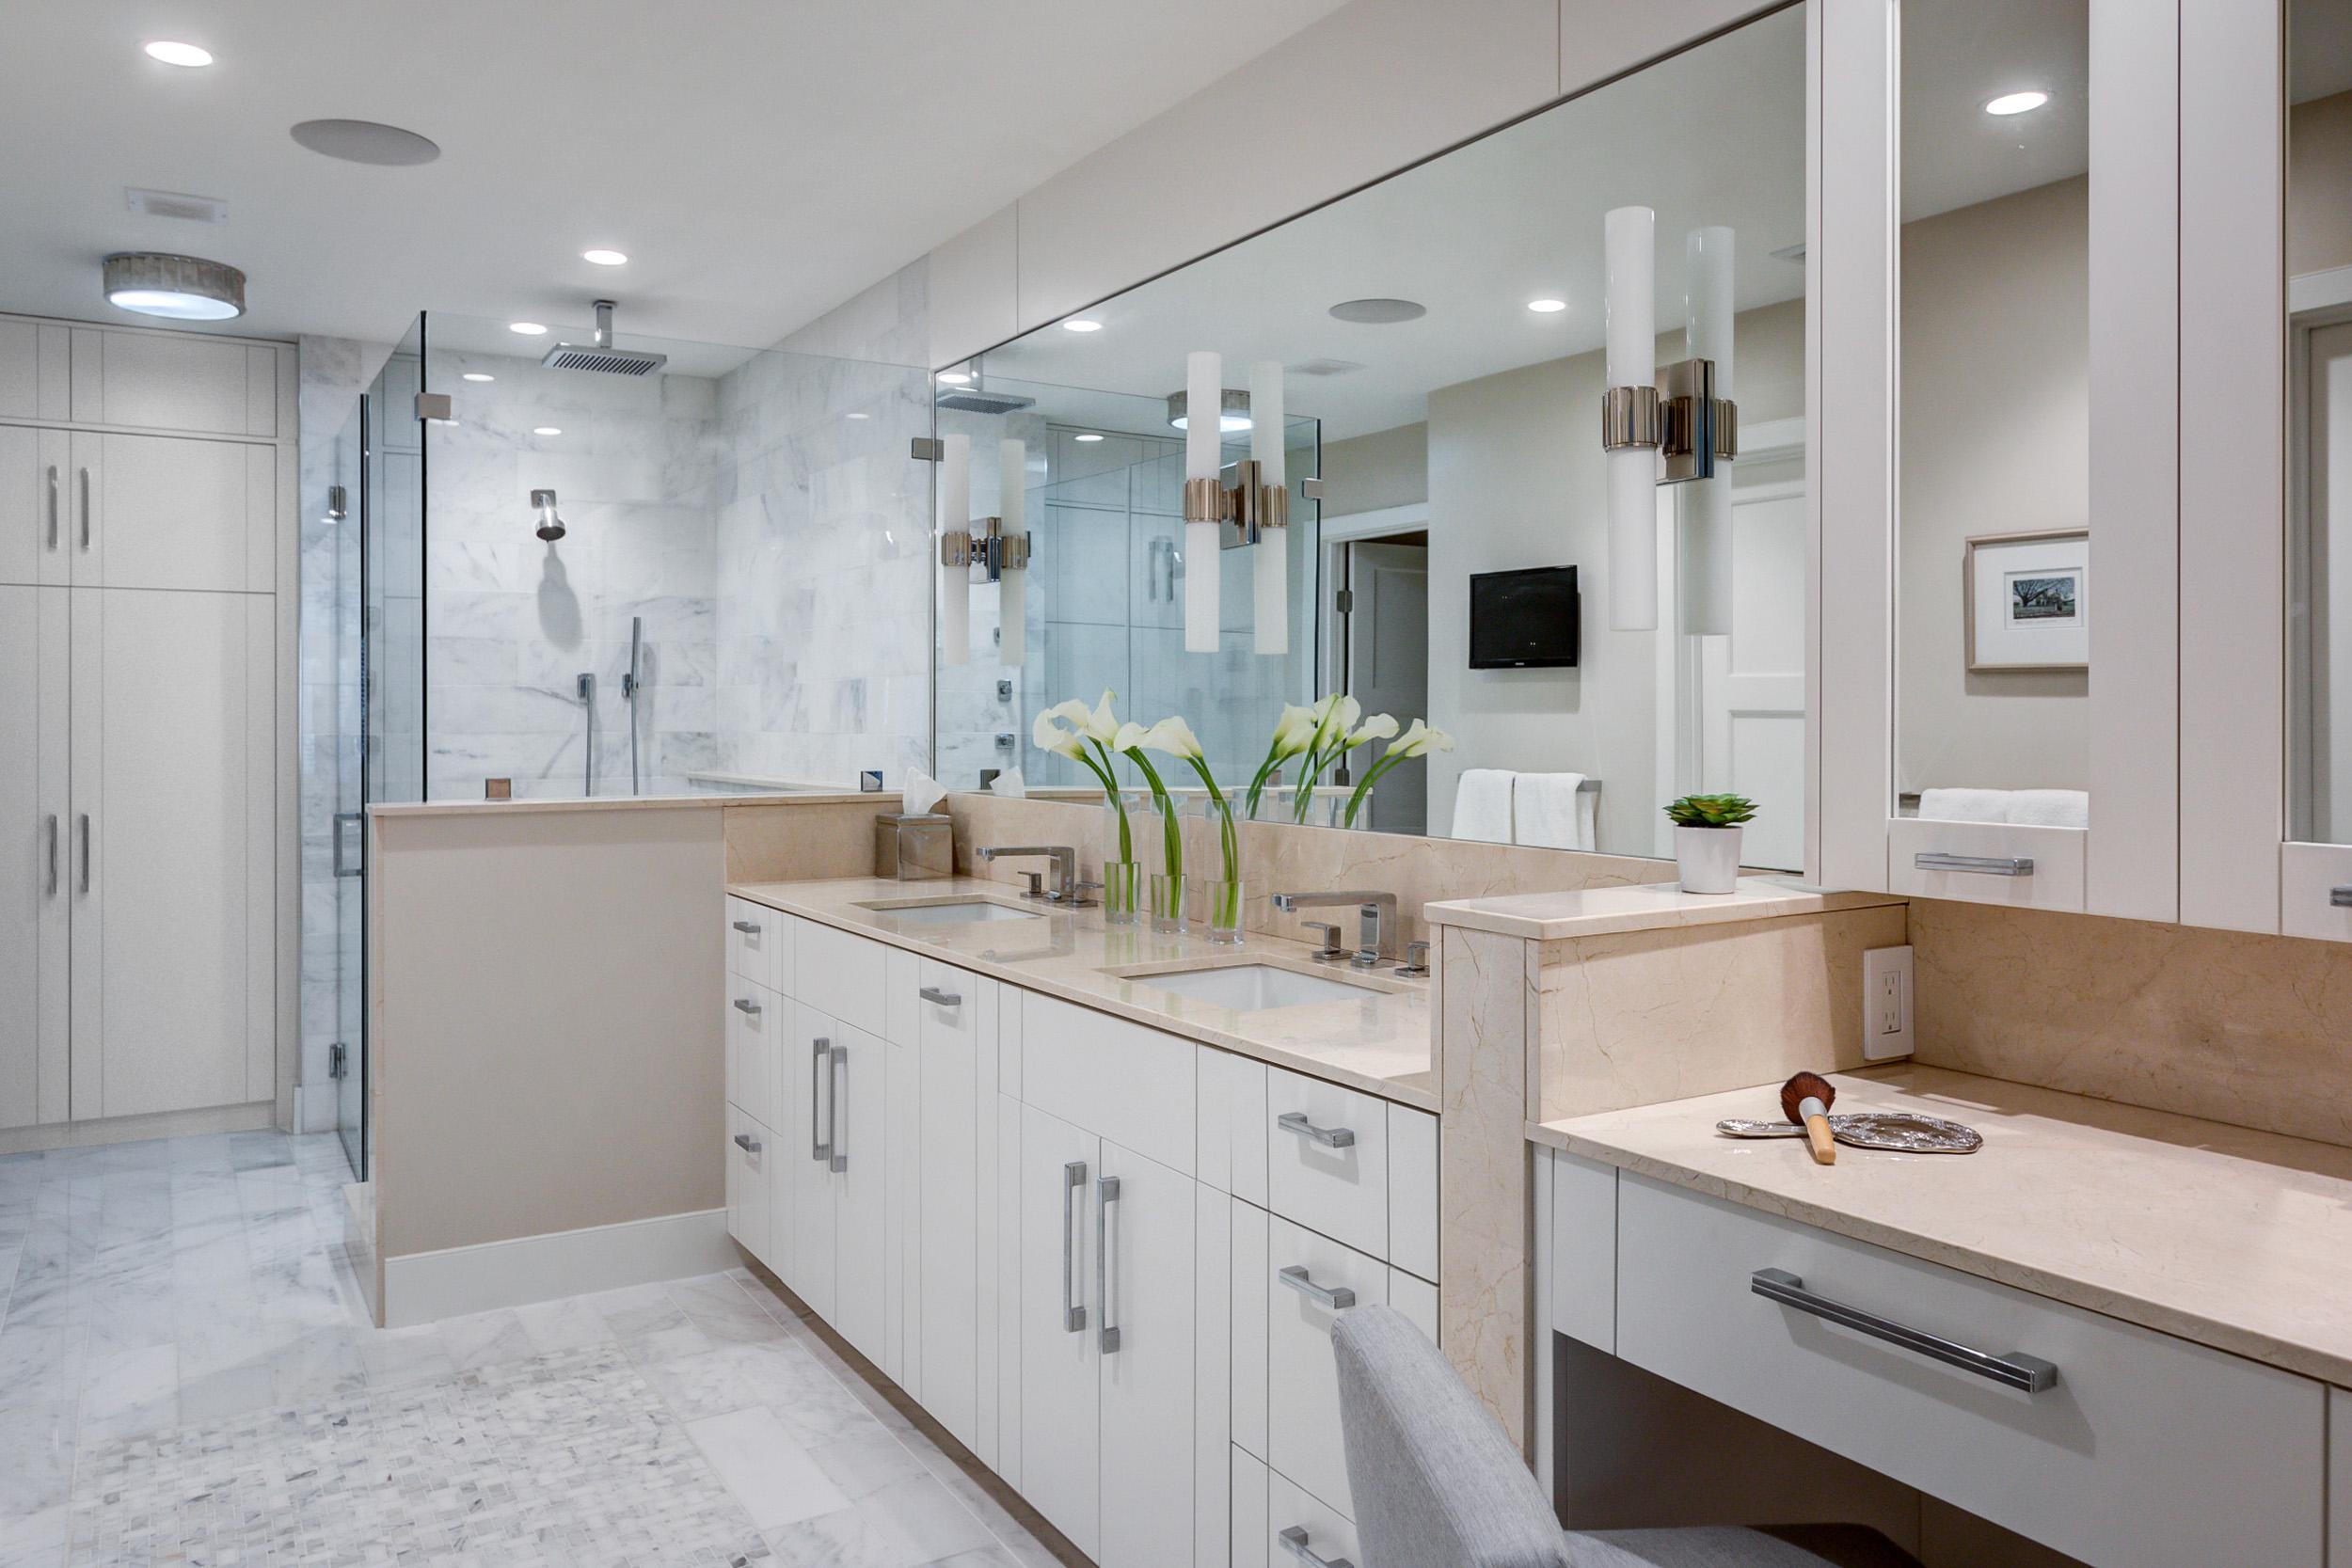 4-KitchenVisions-Master-Baths-Dedham-2.jpg